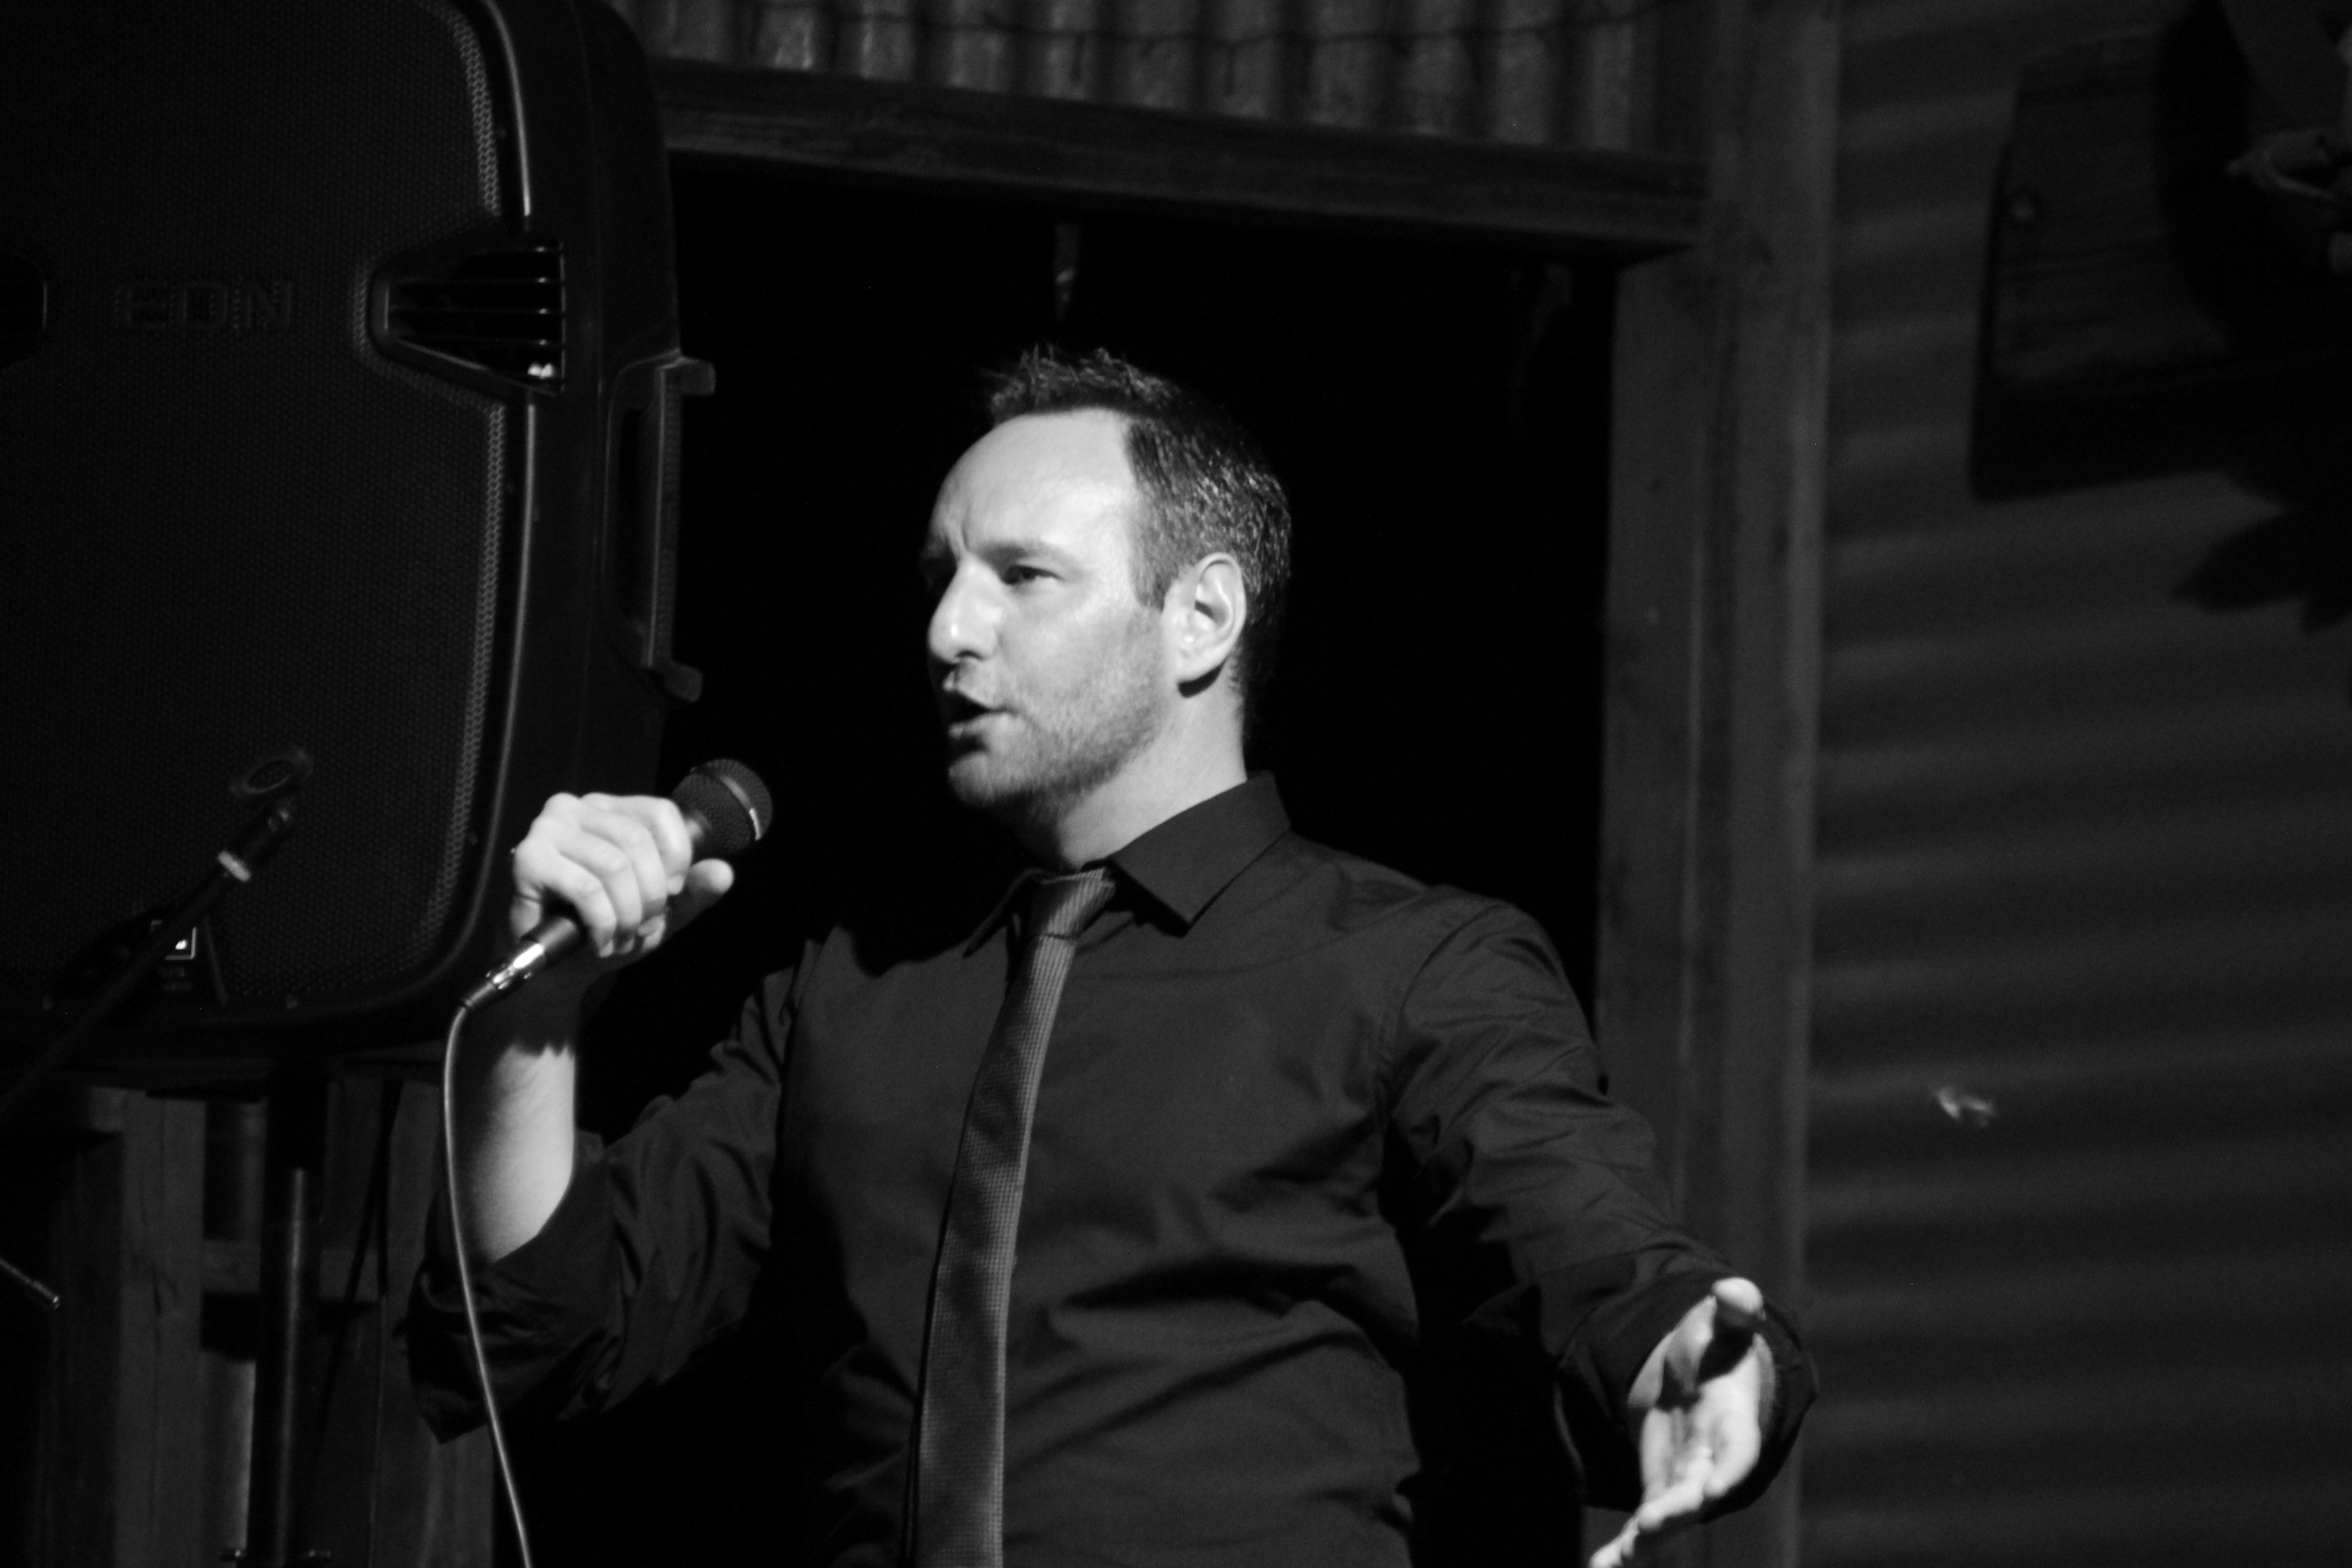 Brad Cooper performing in Silverton Dec 2015